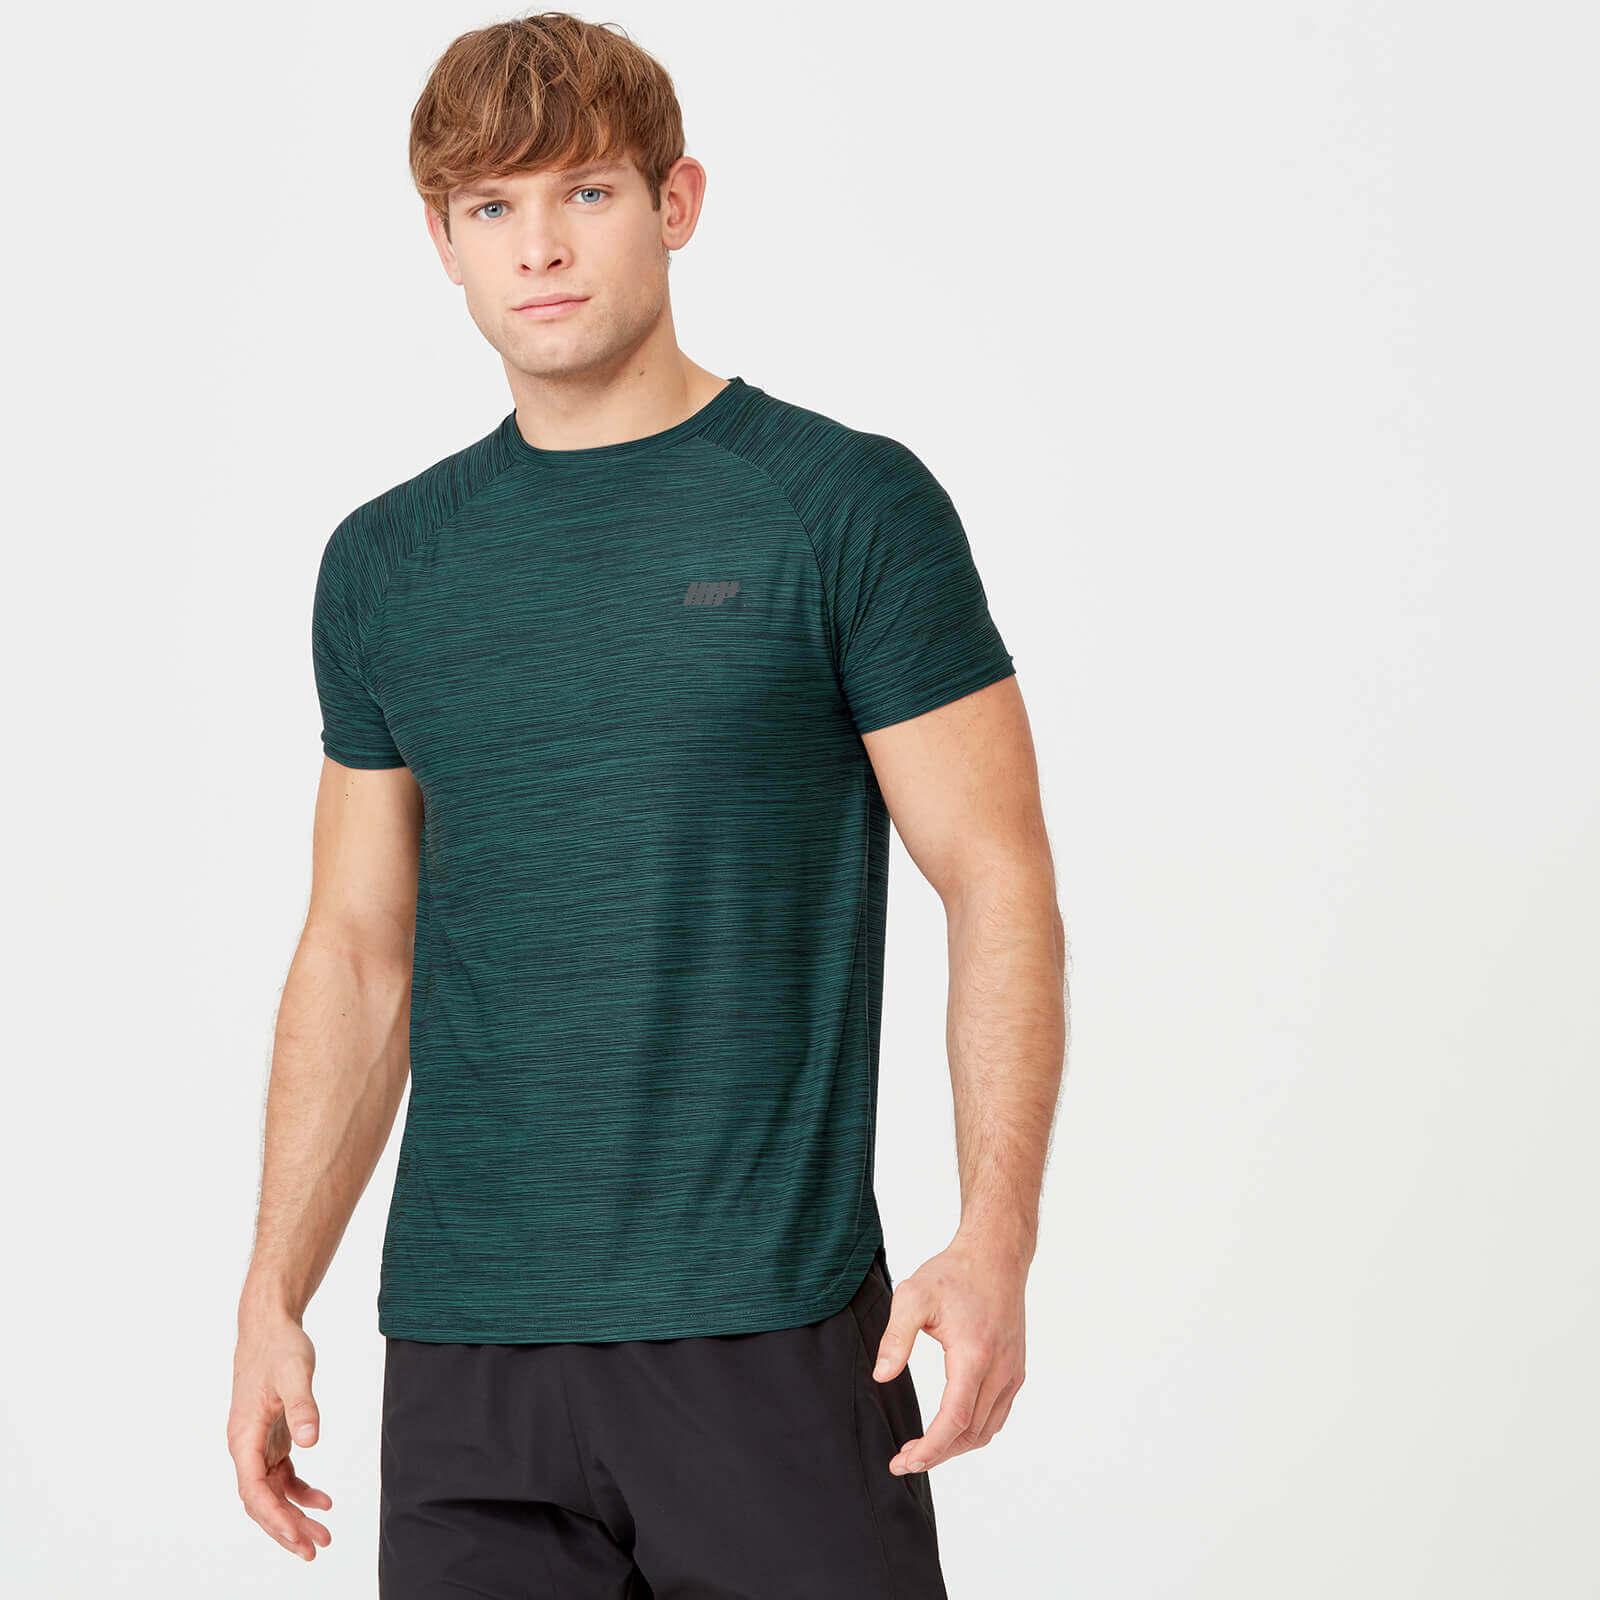 9ee7d1dda Dry-Tech Infinity T-Shirt - Dark Green Marl